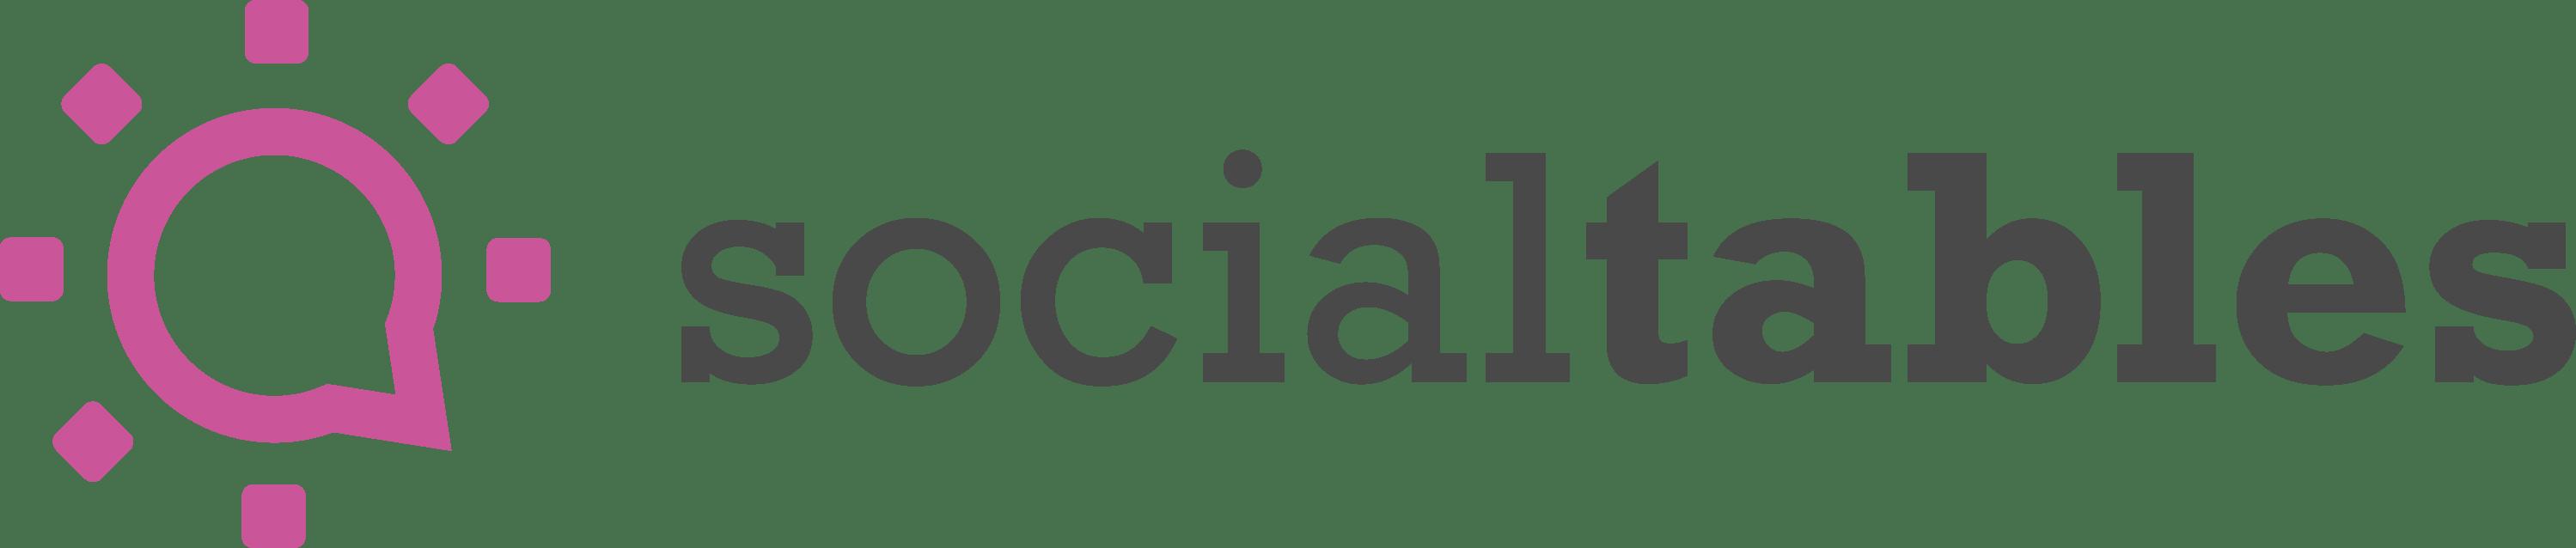 Social Tables Tech Tuesday